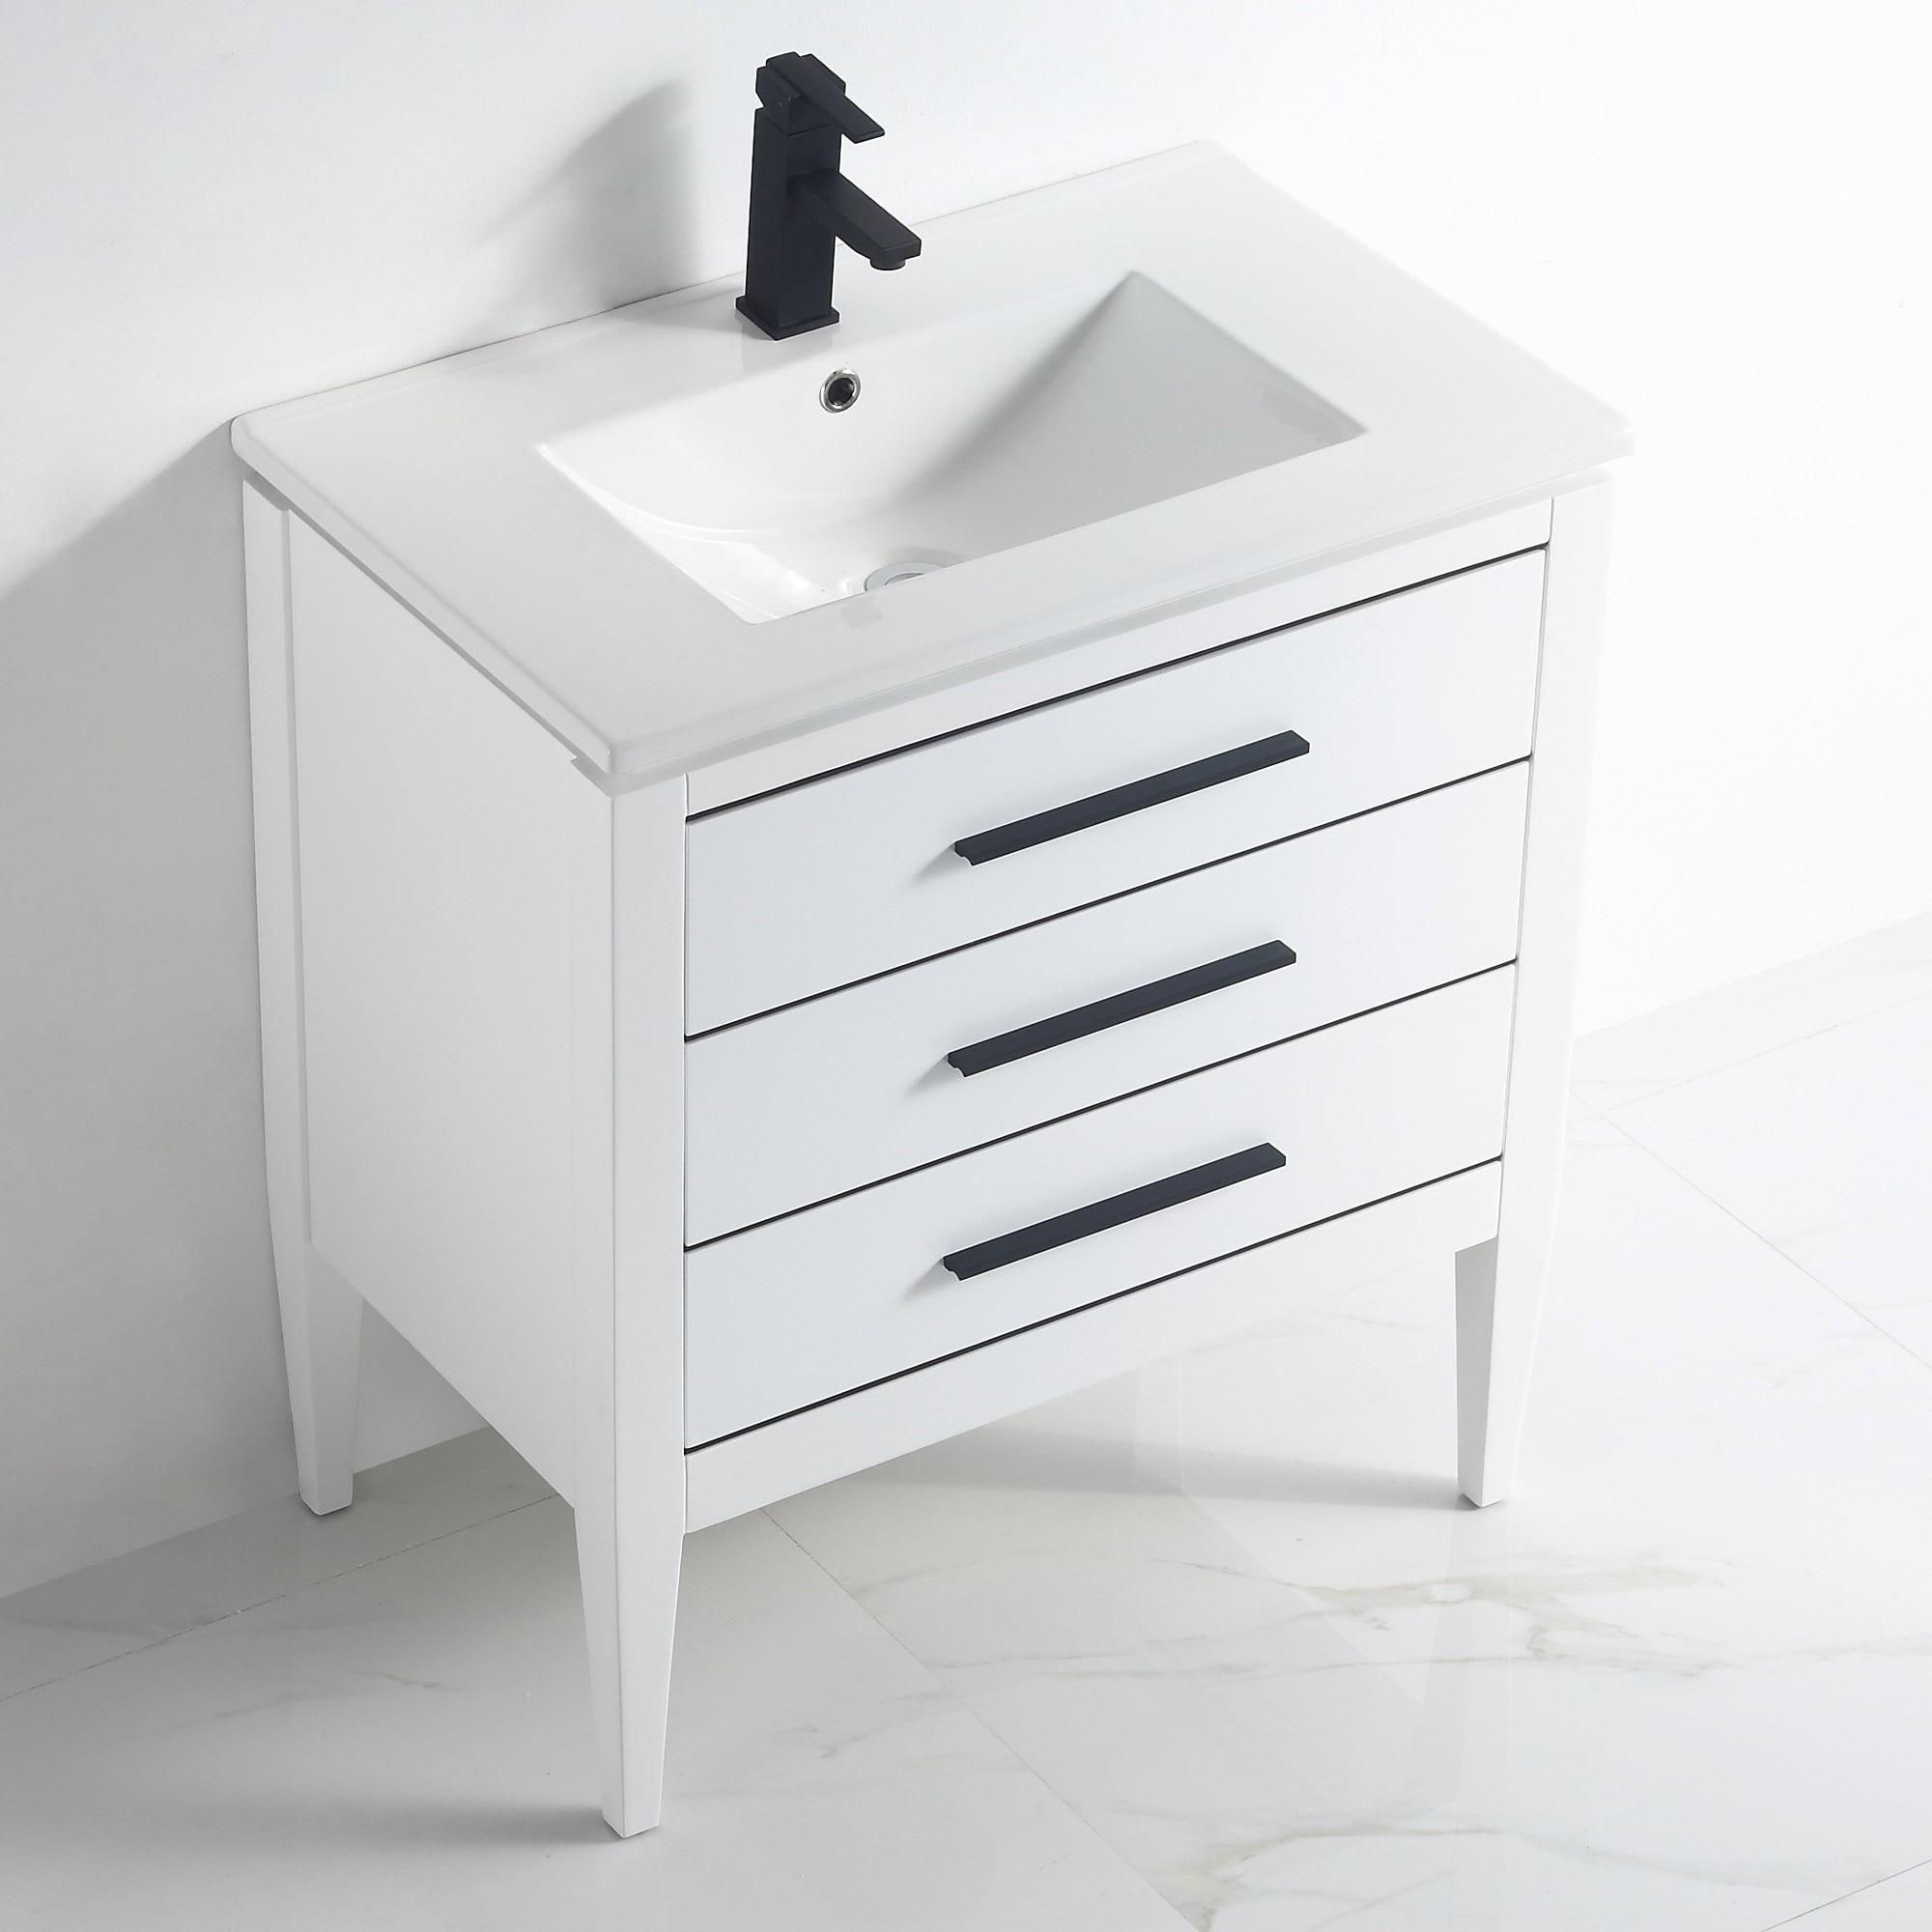 Ayer 30 Inch Single Bathroom Vanity Set Overstock 32517442